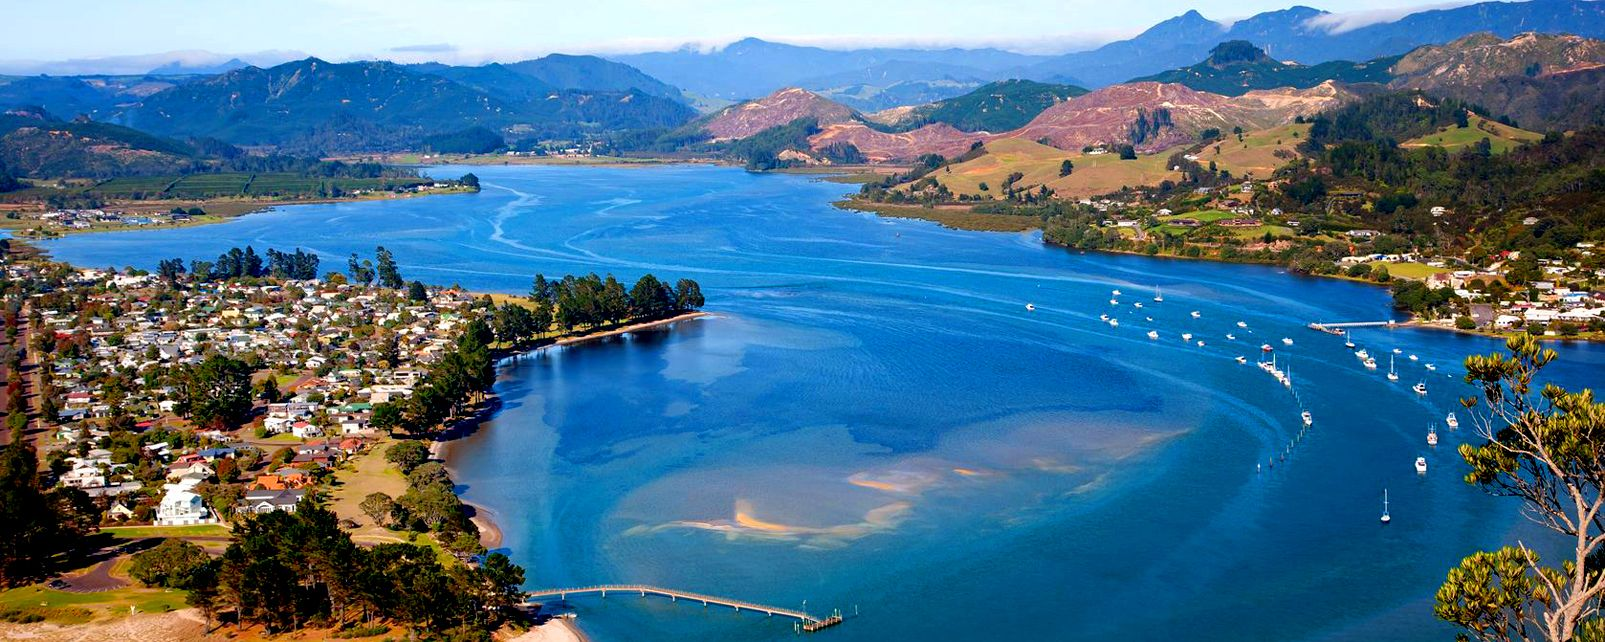 North Island Coromandel Peninsula New Zealand